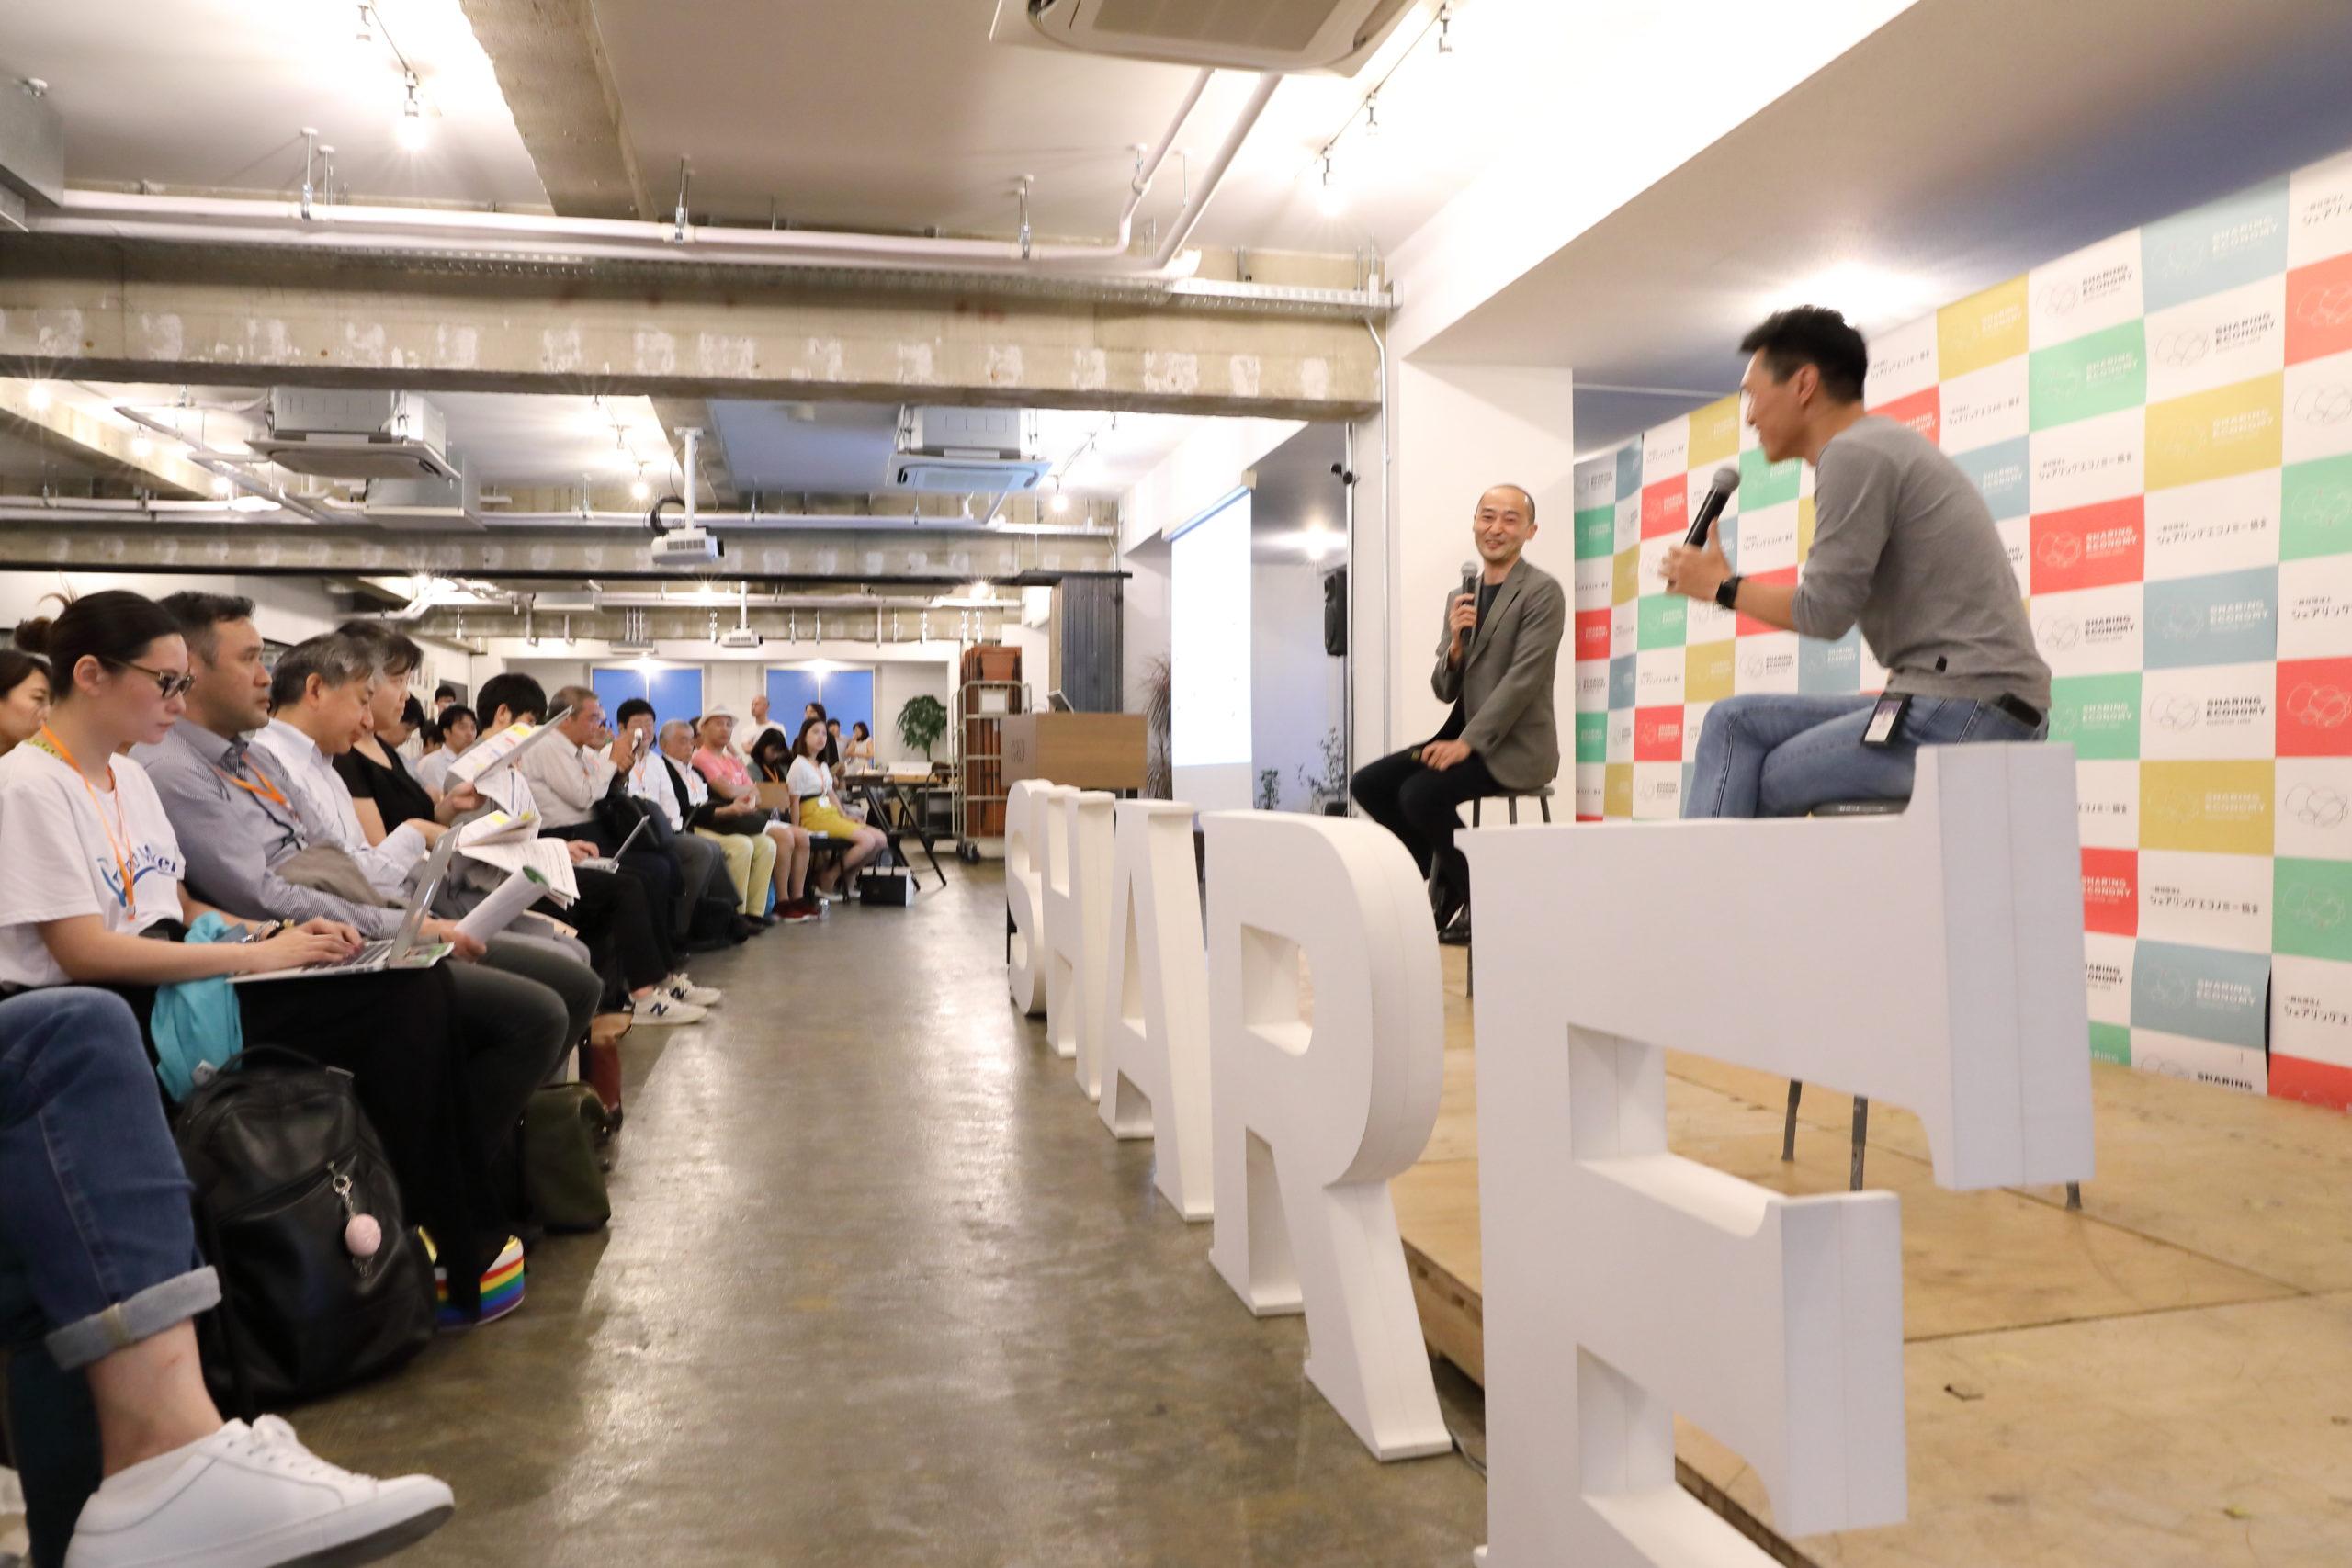 Meetup Vol.12 開催レポート「企業のシェアリングエコノミー戦略 – サービス開発、業務提携、資本提携戦略のすべて」